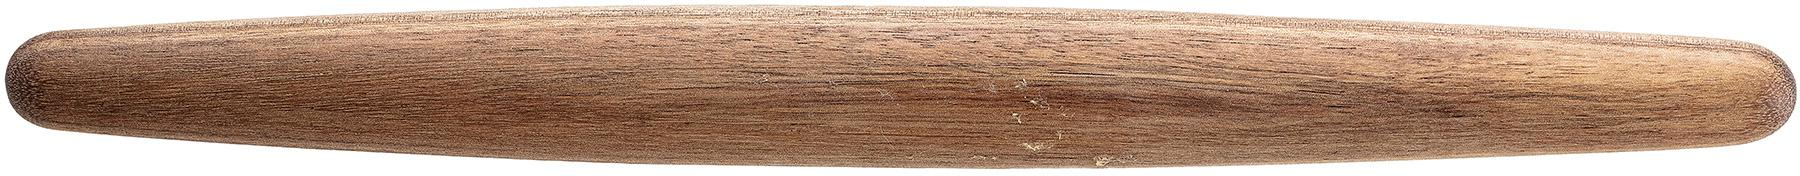 Deegroller Alicja, Acaciahout, Acaciahoutkleurig, L 33 cm